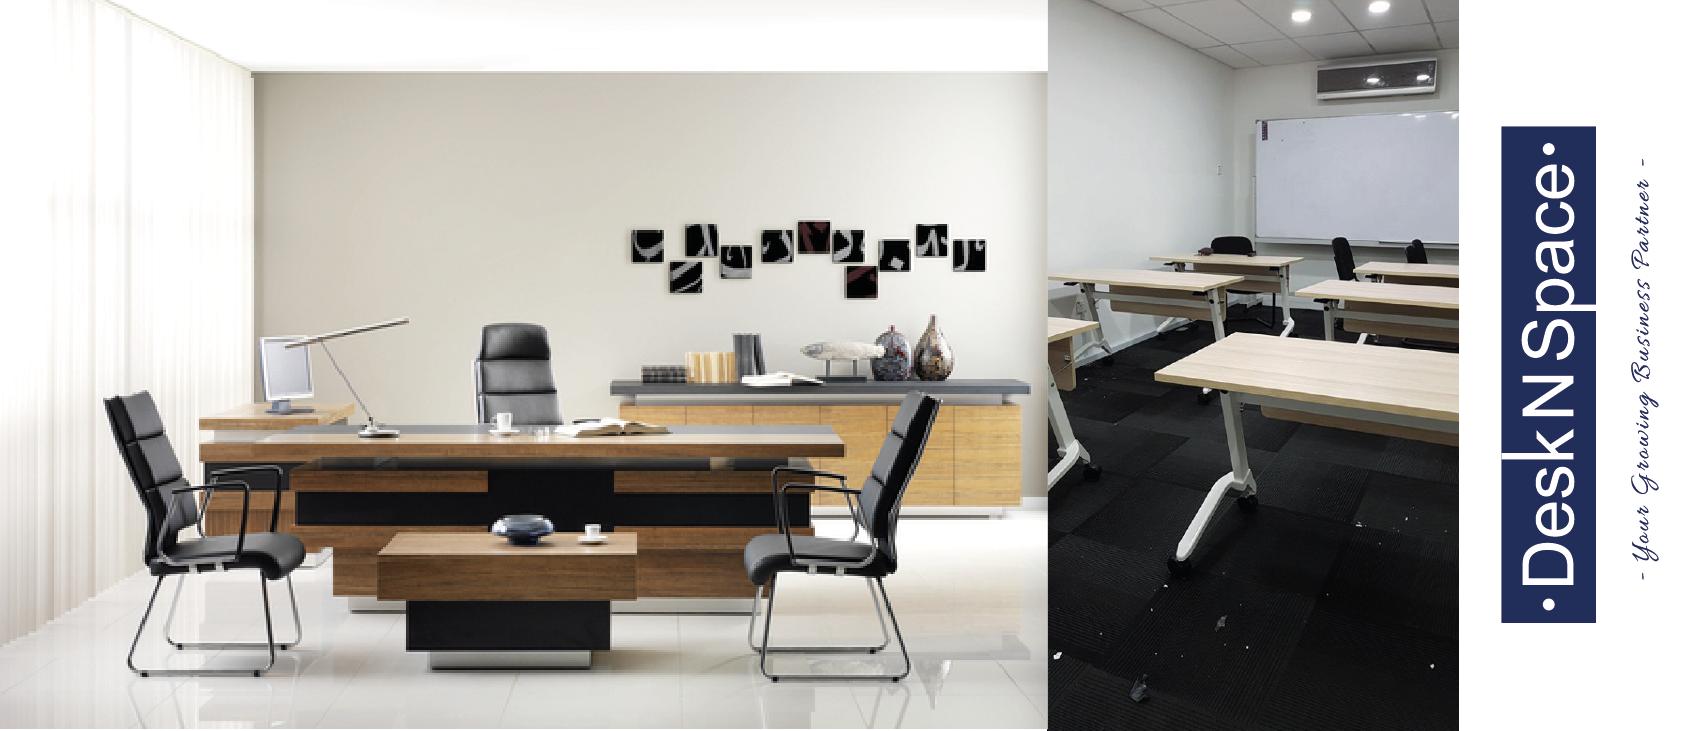 offices in space gen rooms b hp ca meeting virtual office canada regus